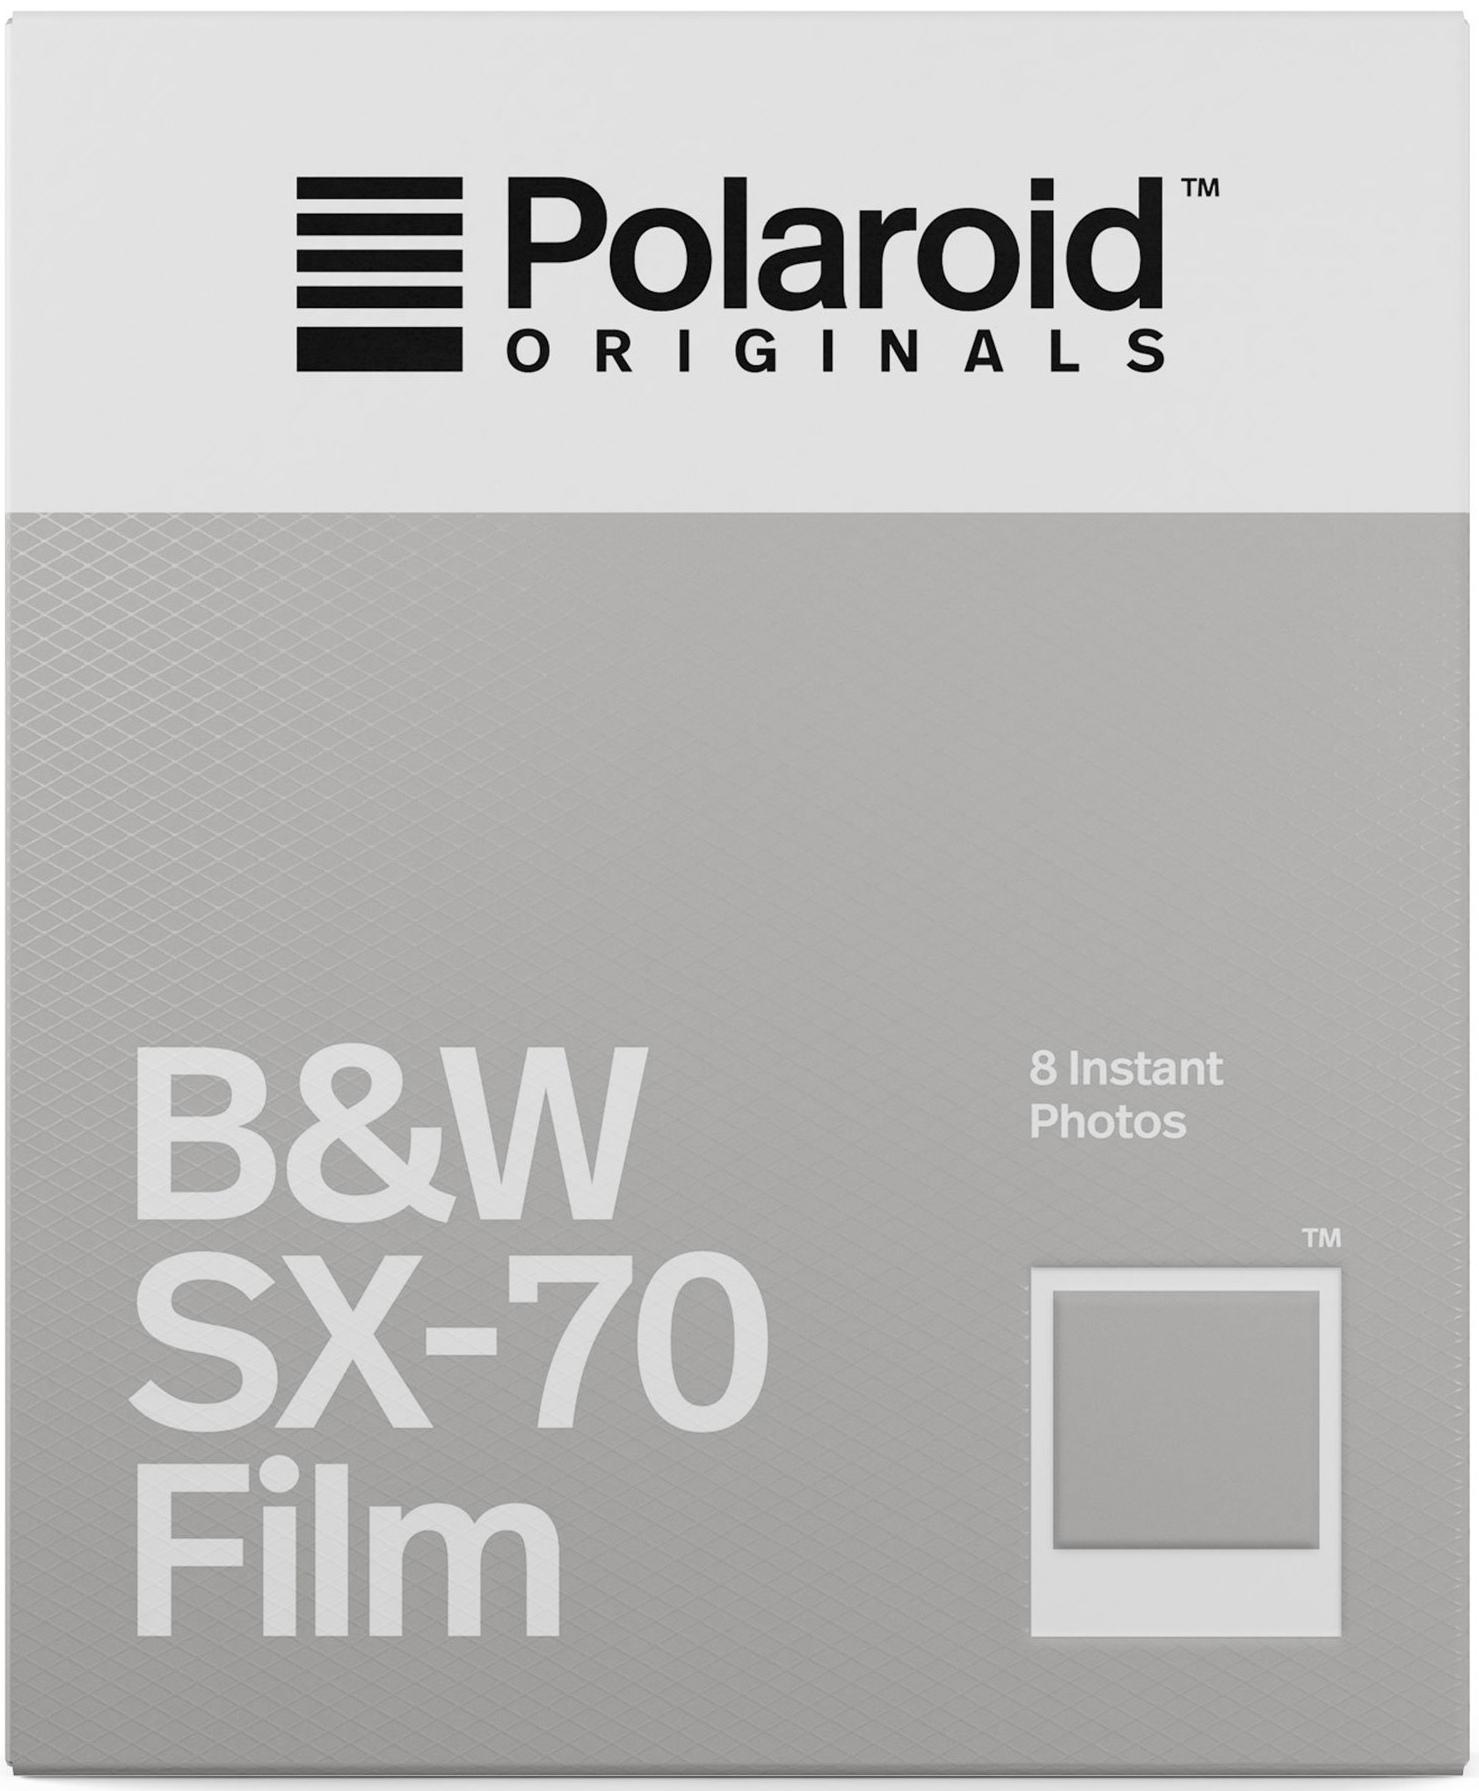 POLAROID ORIGINALS černobílý film pro Polaroid SX-70/8 ks